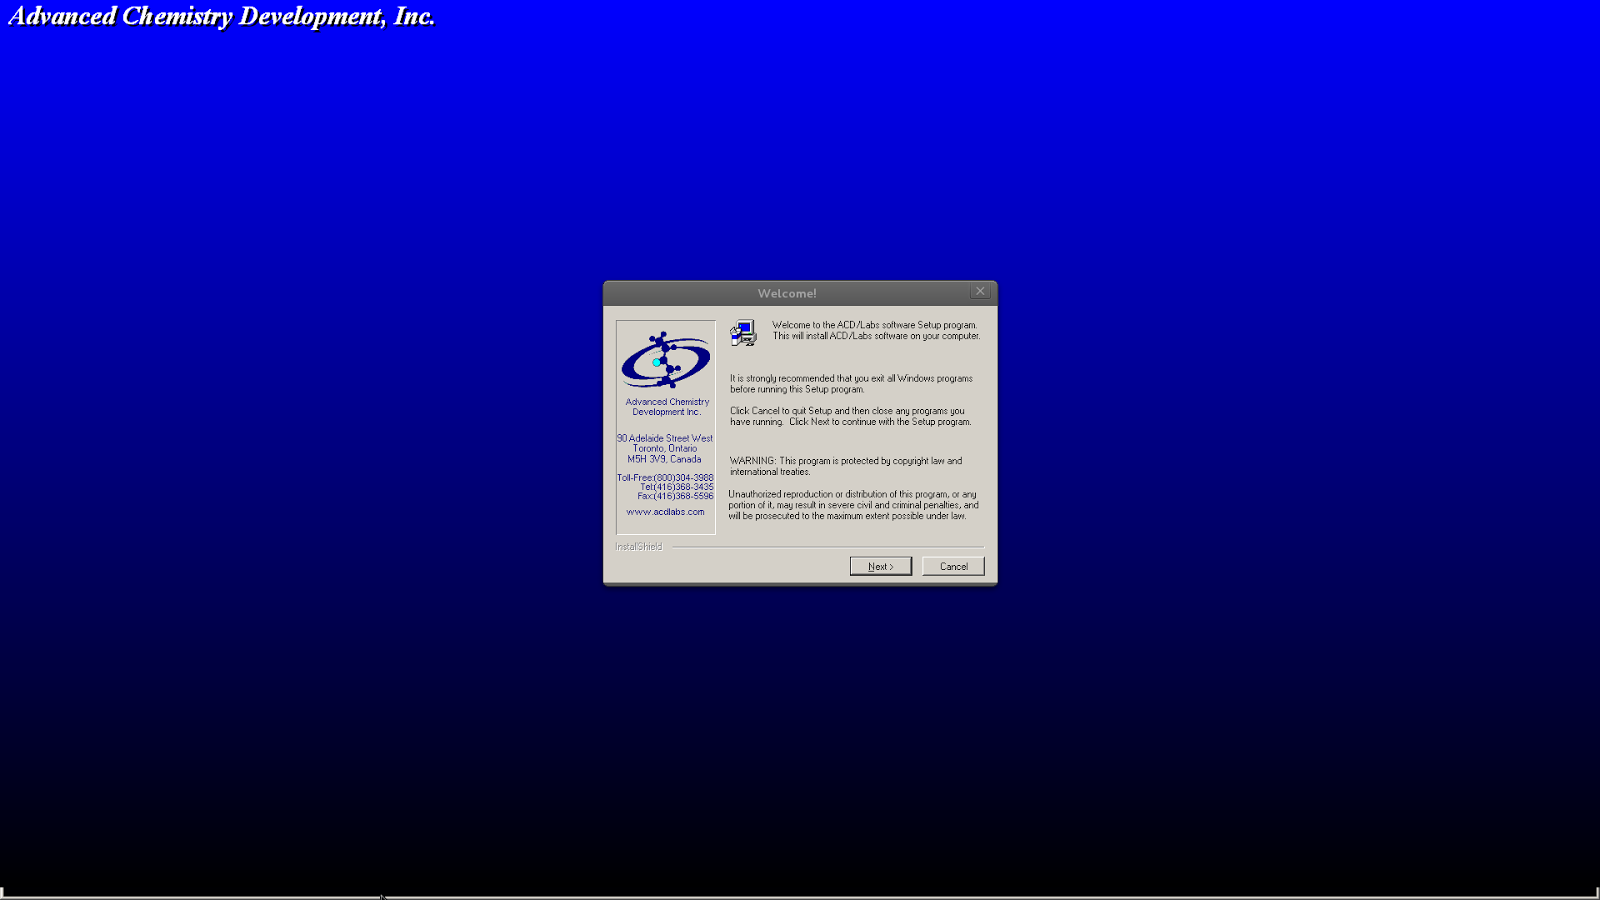 chemsketch free download for windows 7 64 bit